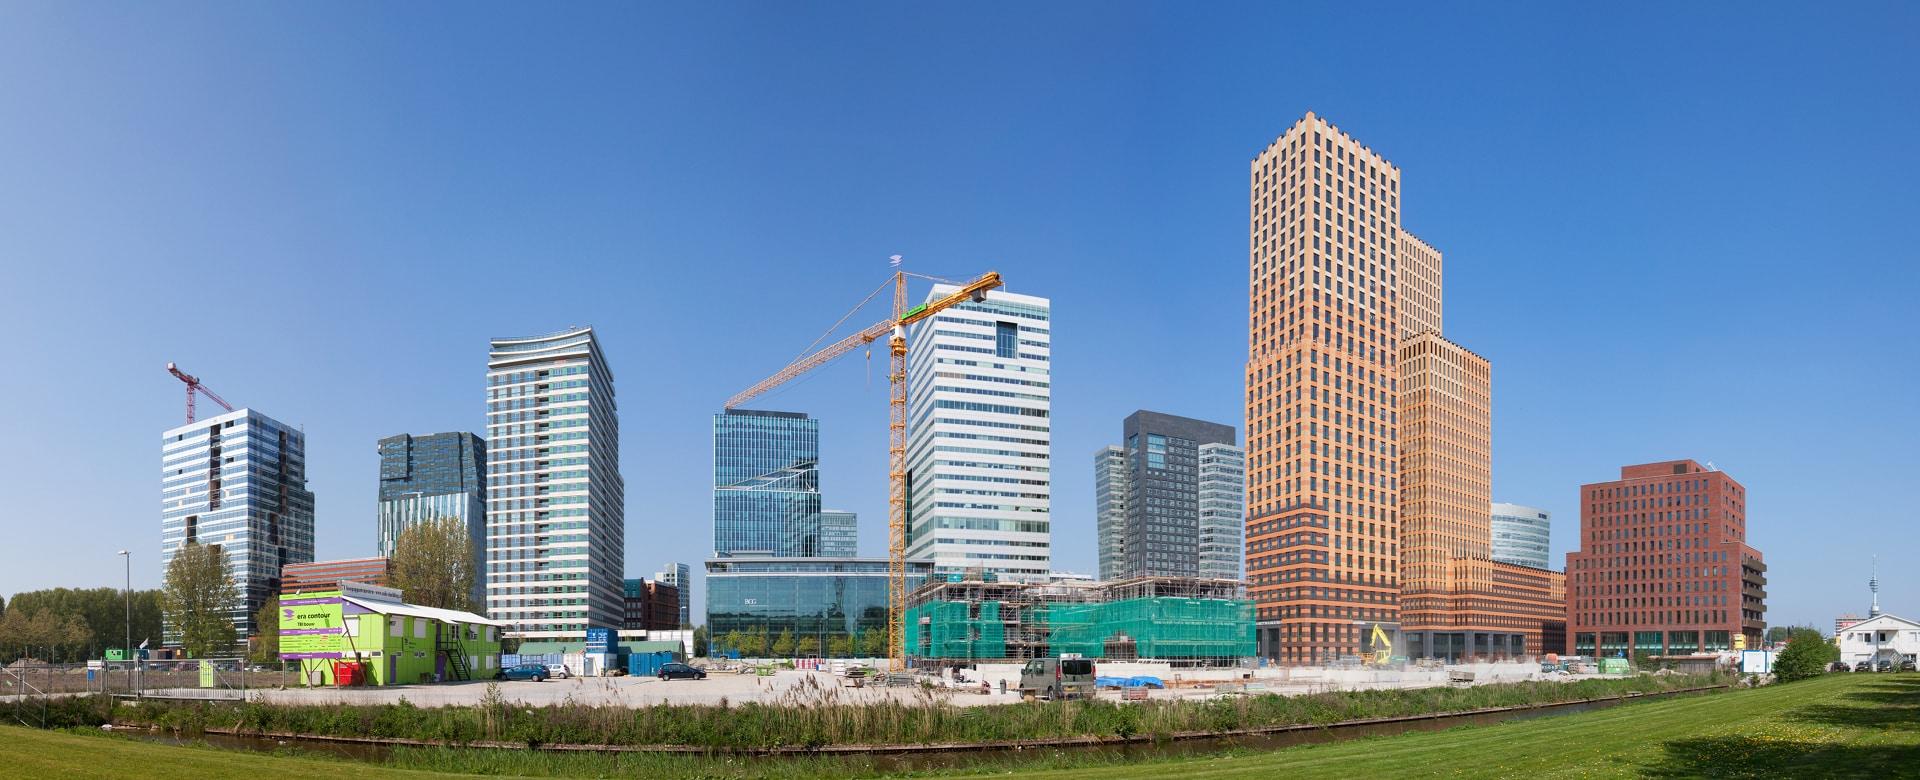 Skyline-ZuidasAmsterdam